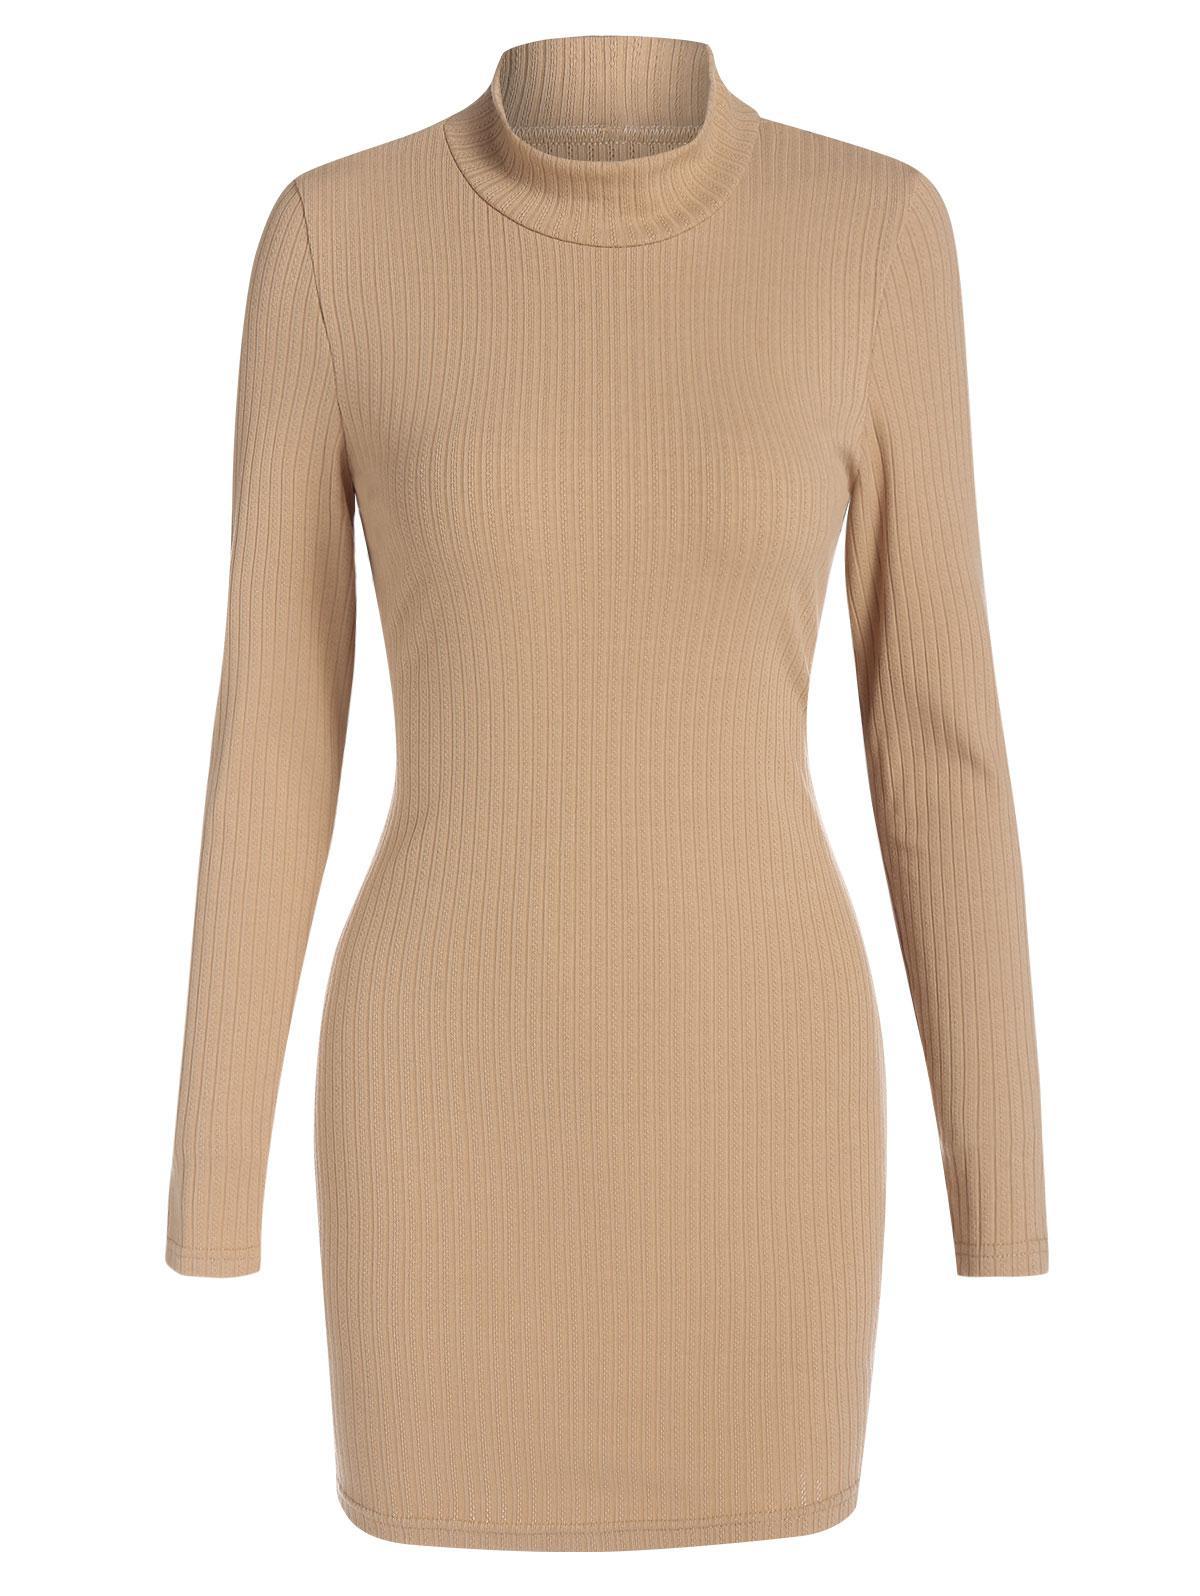 ZAFUL Cutout Mock Neck Mini Bodycon Dress